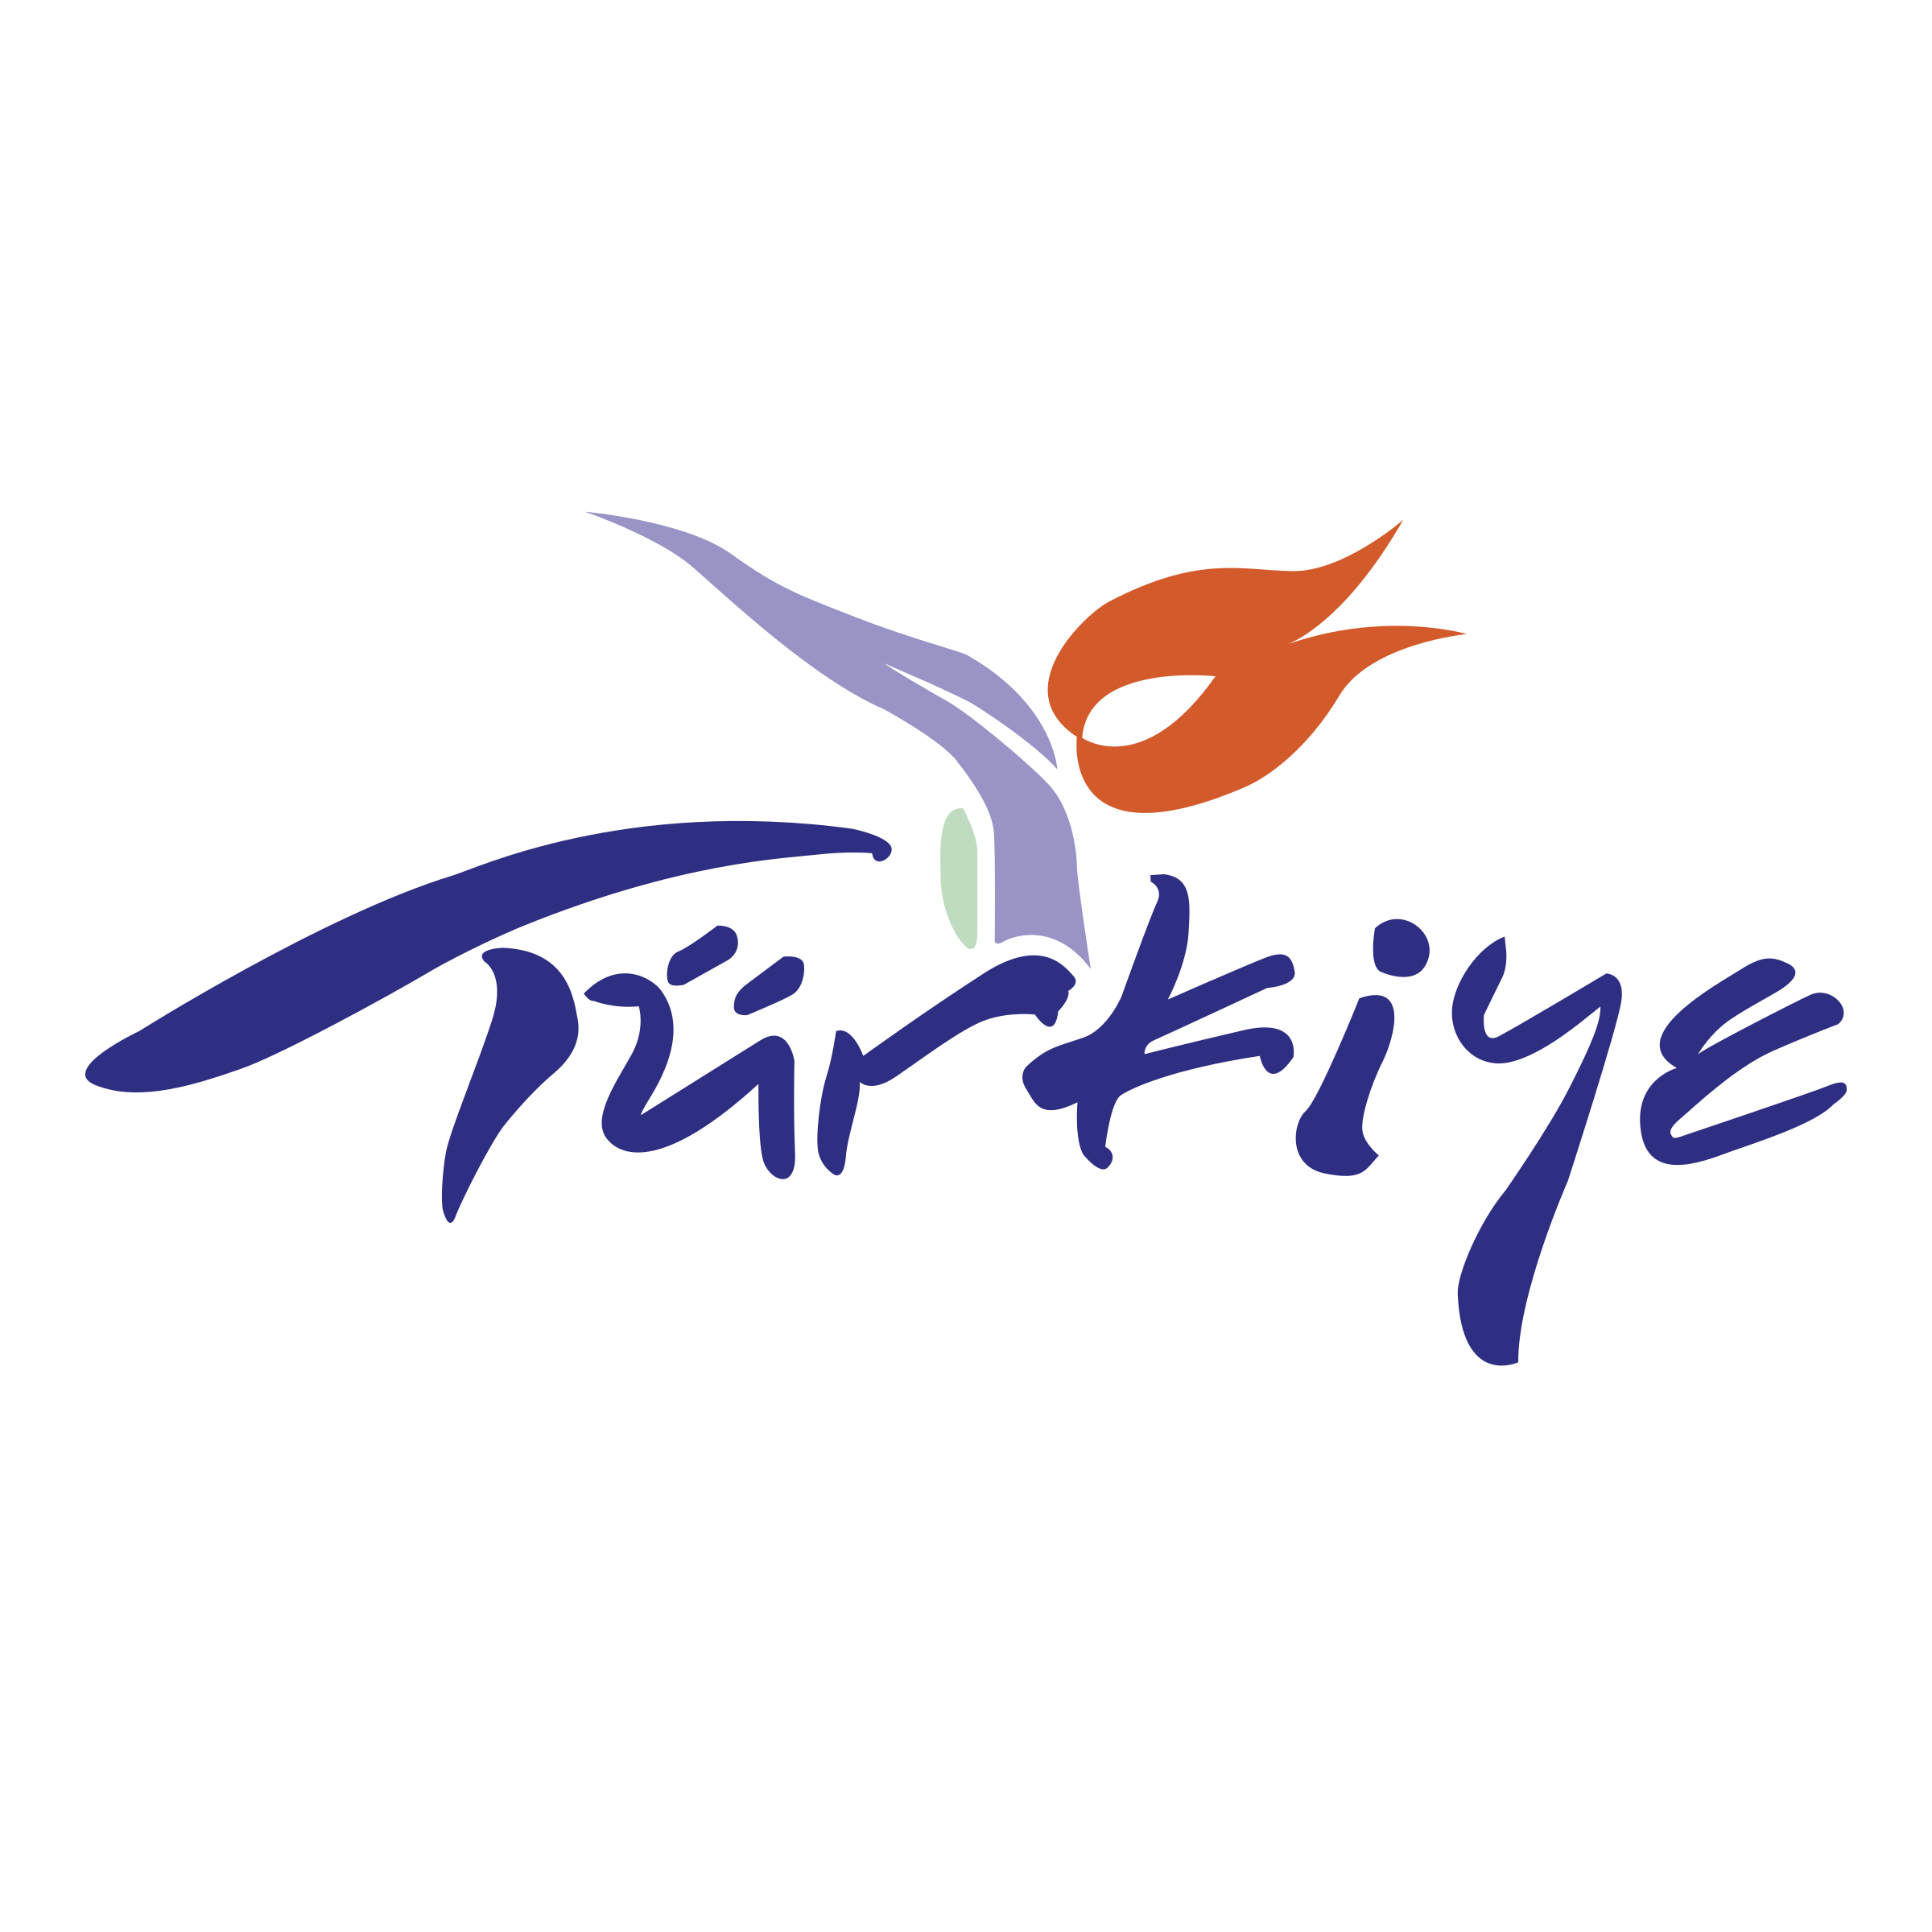 Turkiye Logo PNG Transparent & SVG Vector - Freebie Supply